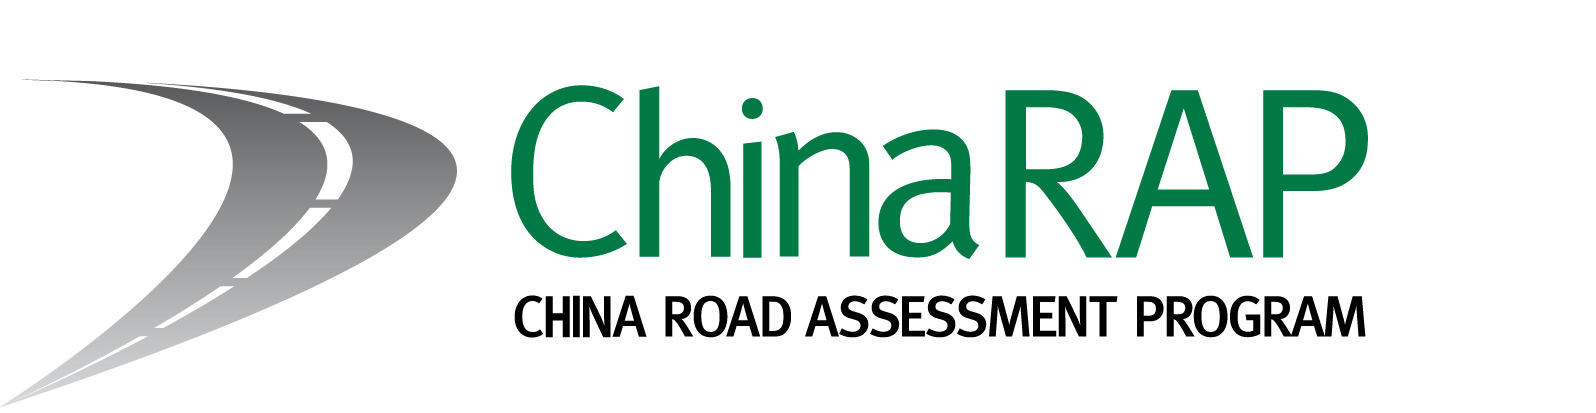 ChinaRAP: Zhengtong road redevelopment project